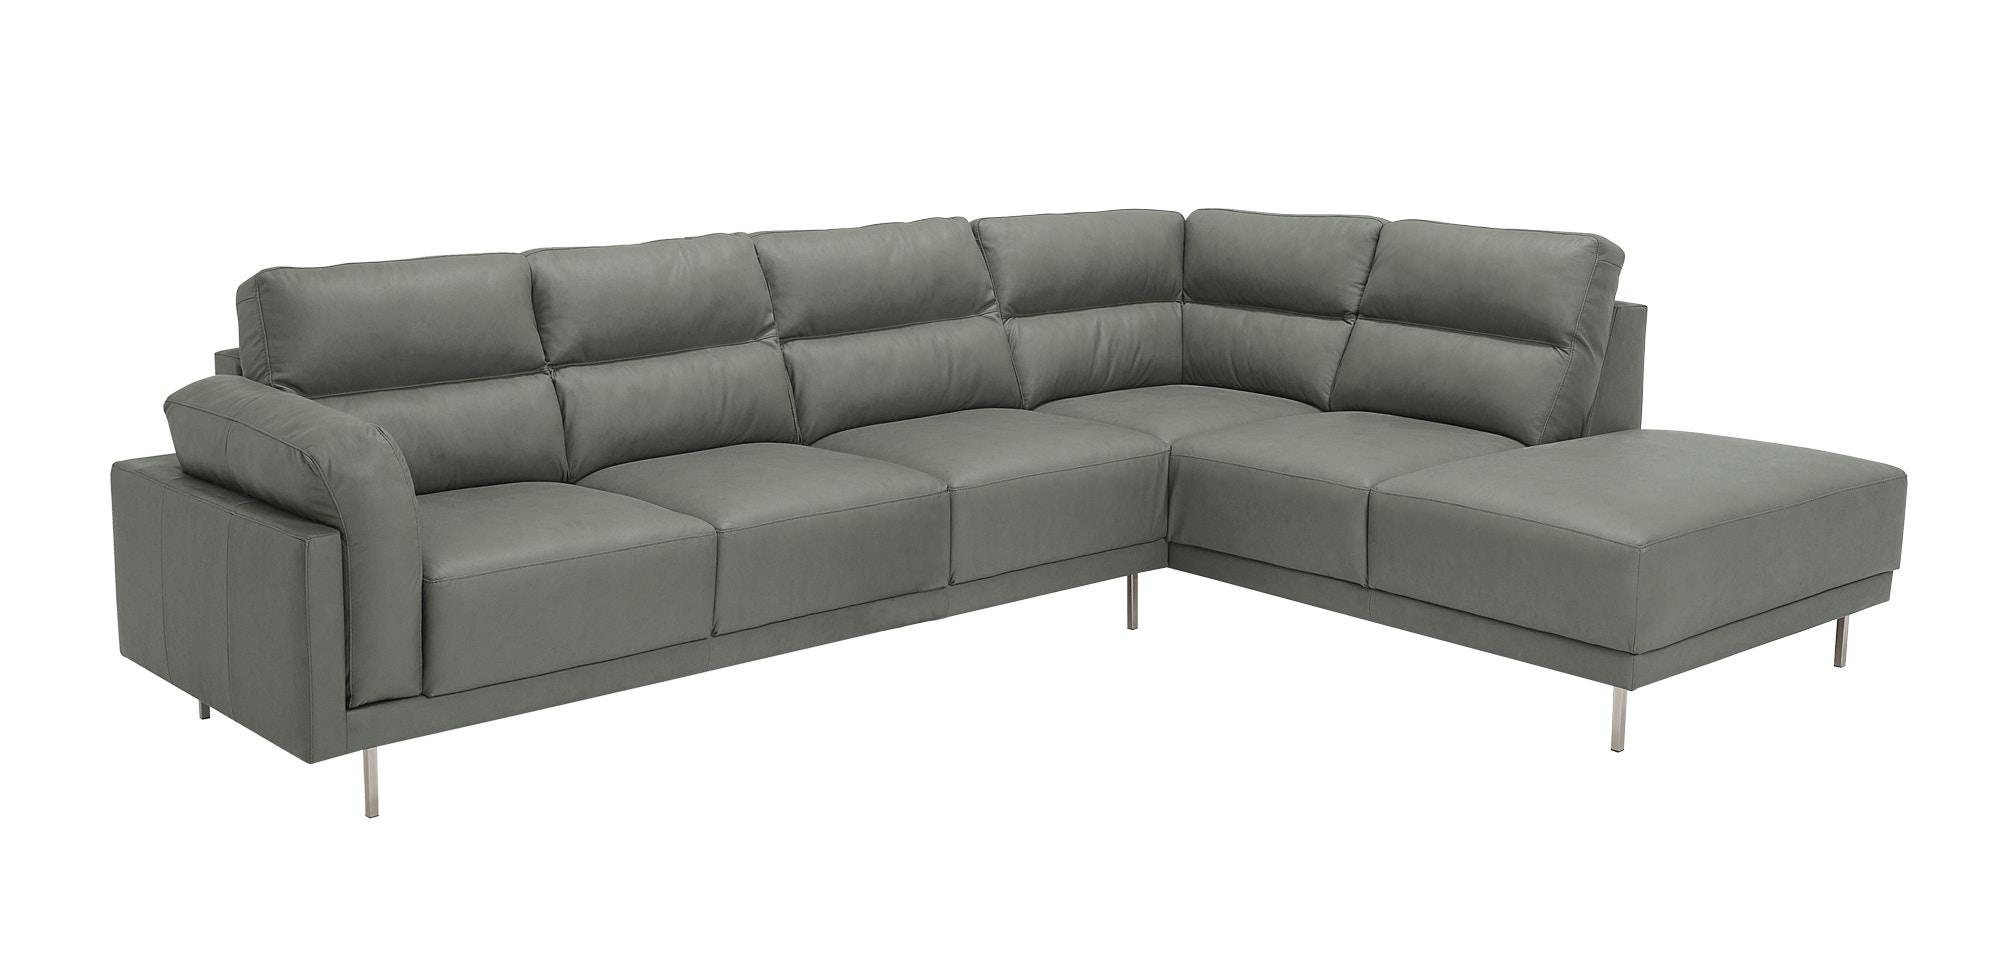 Palliser Living Room Sectional 790402 12 At Talsma Furniture